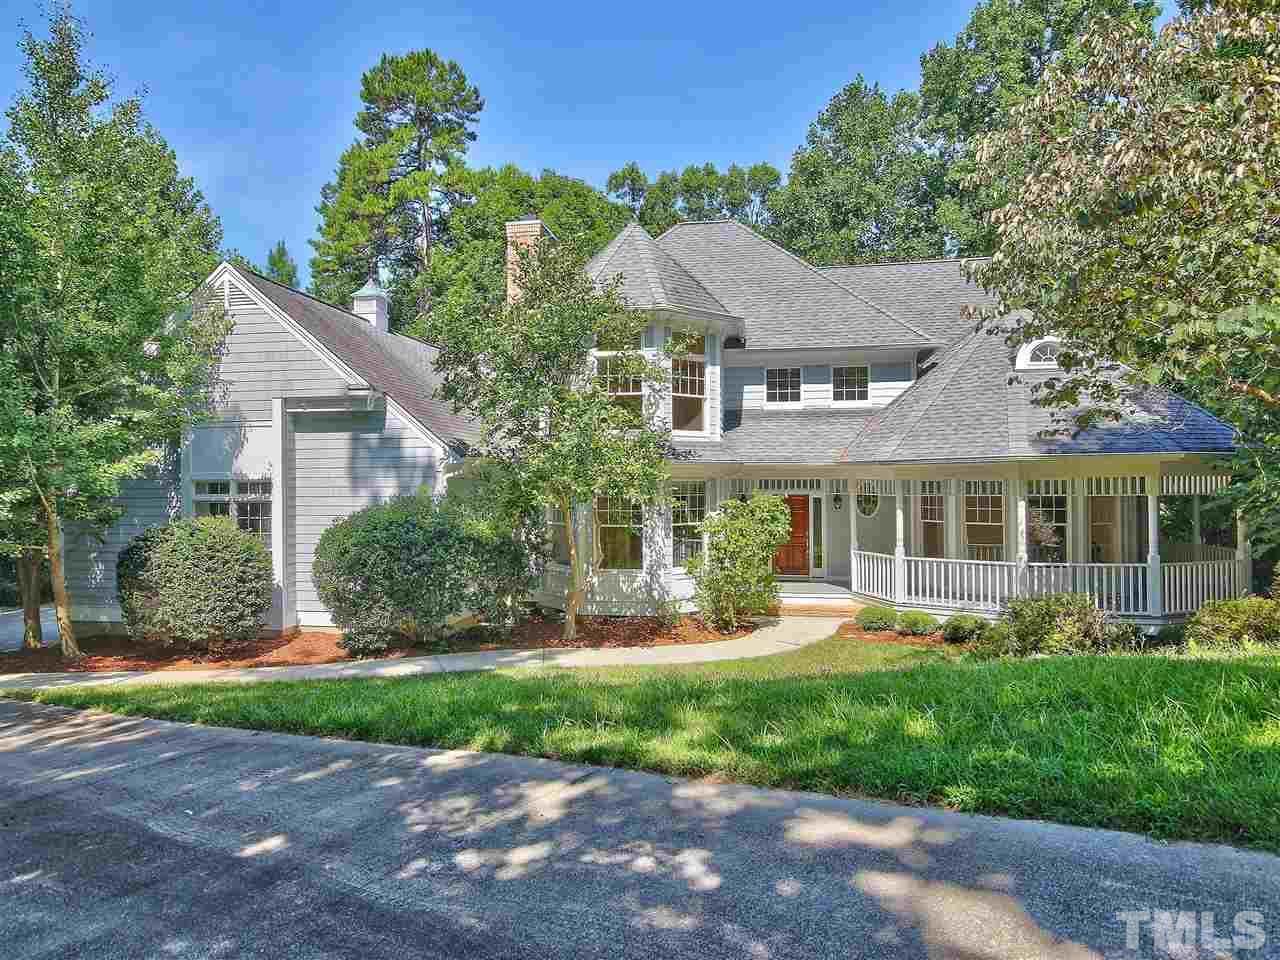 90001 Hoey, Chapel Hill, NC 27517